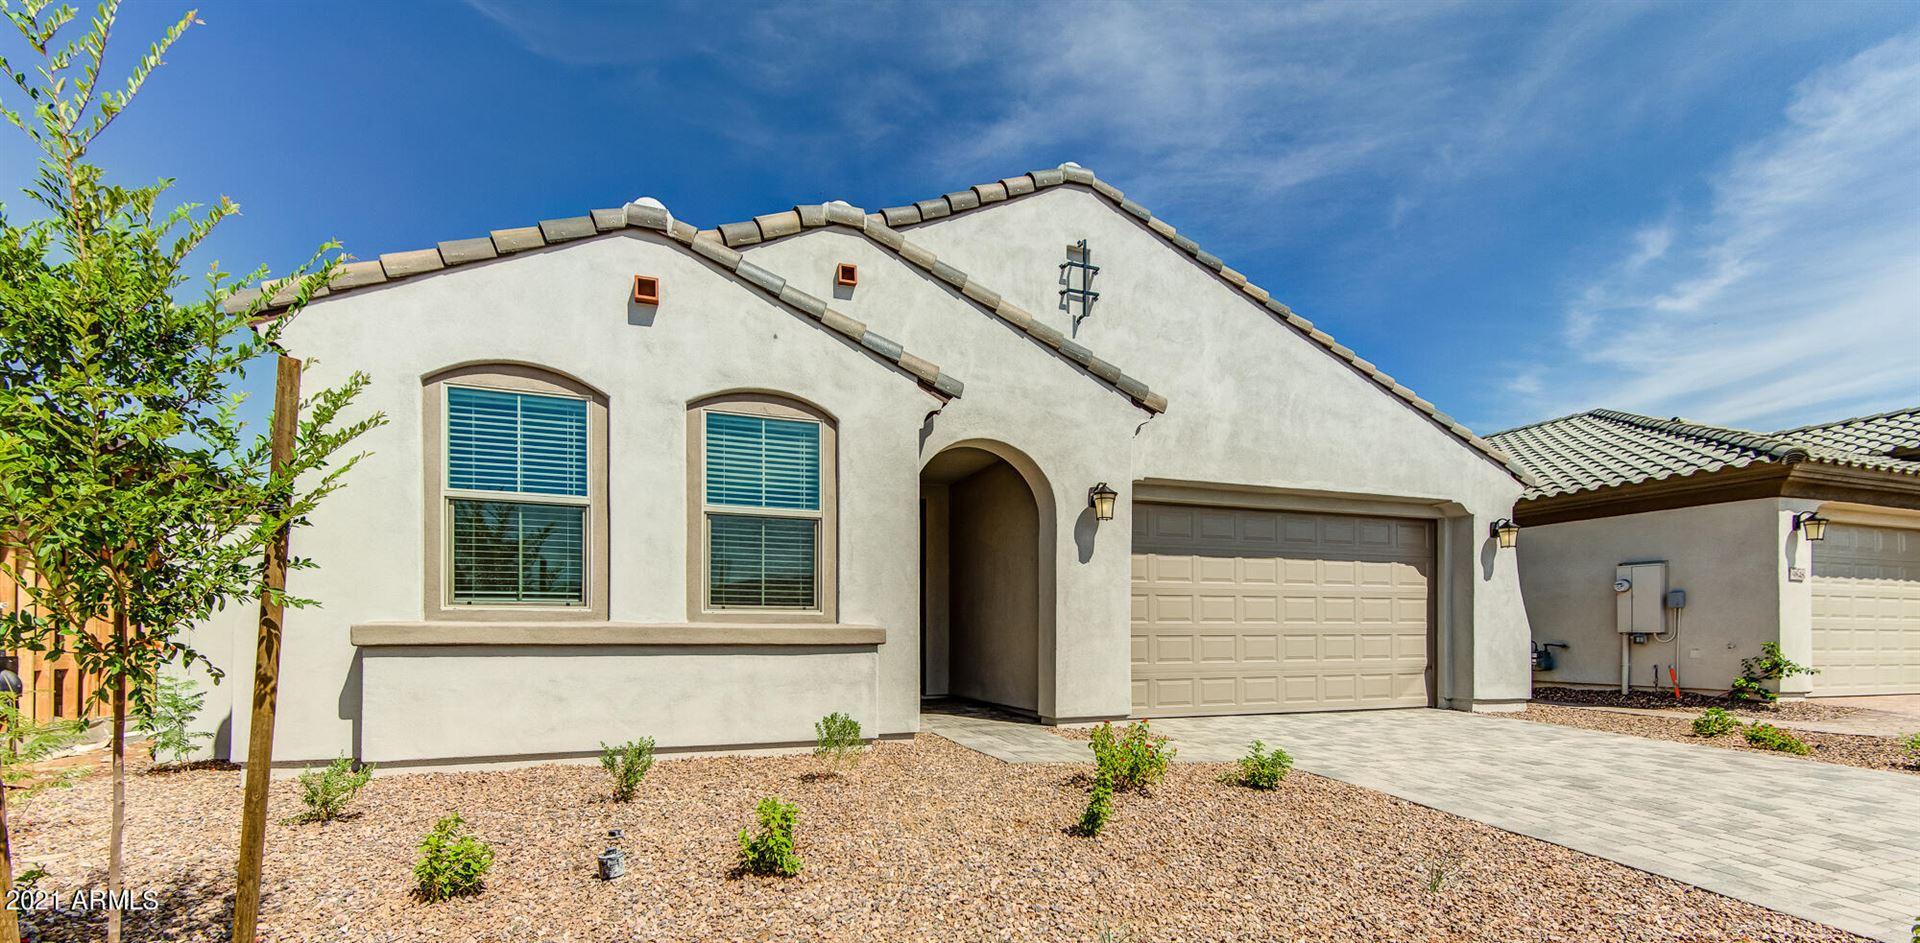 9844 E SUPERNOVA Drive, Mesa, AZ 85212 - MLS#: 6273084